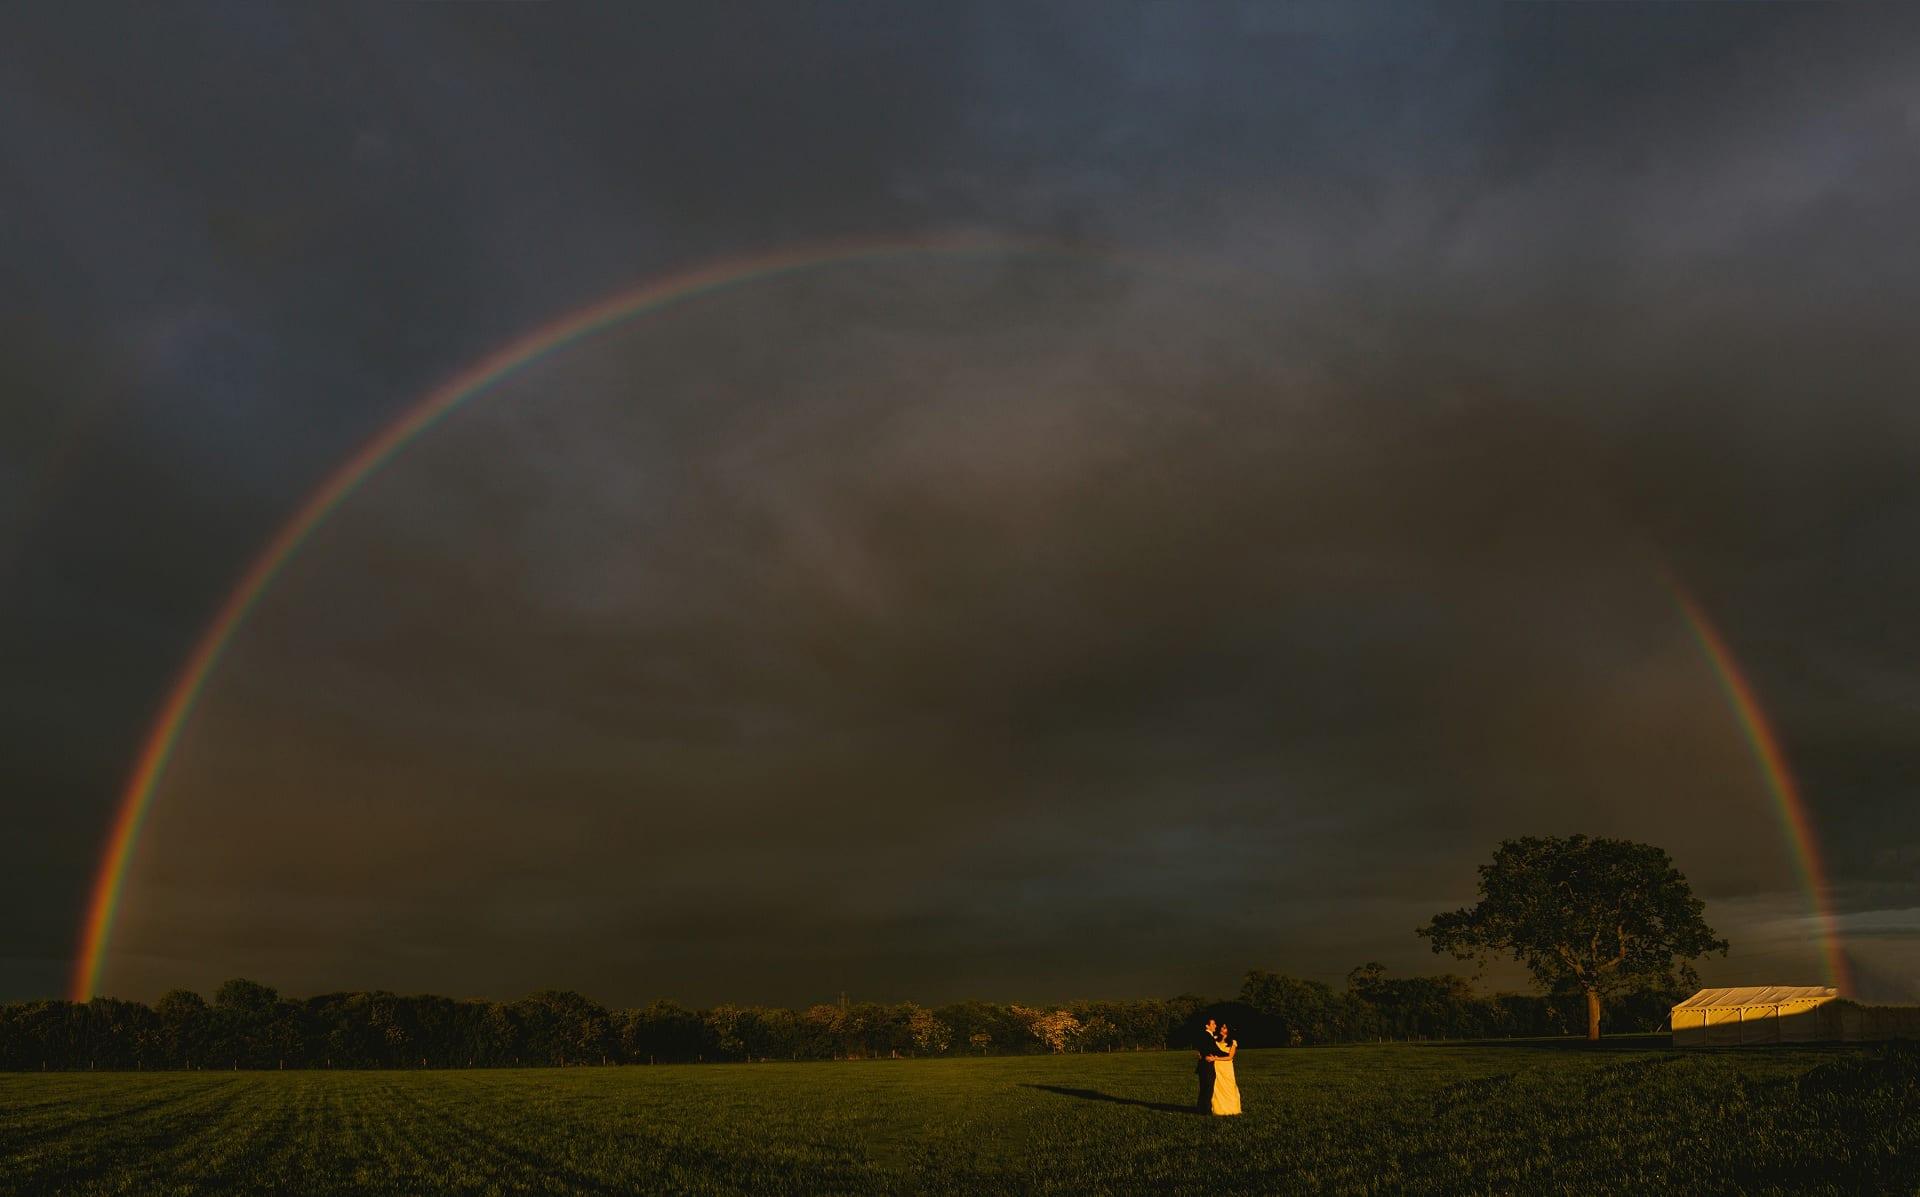 Amazing rainbow over couple on their wedding day